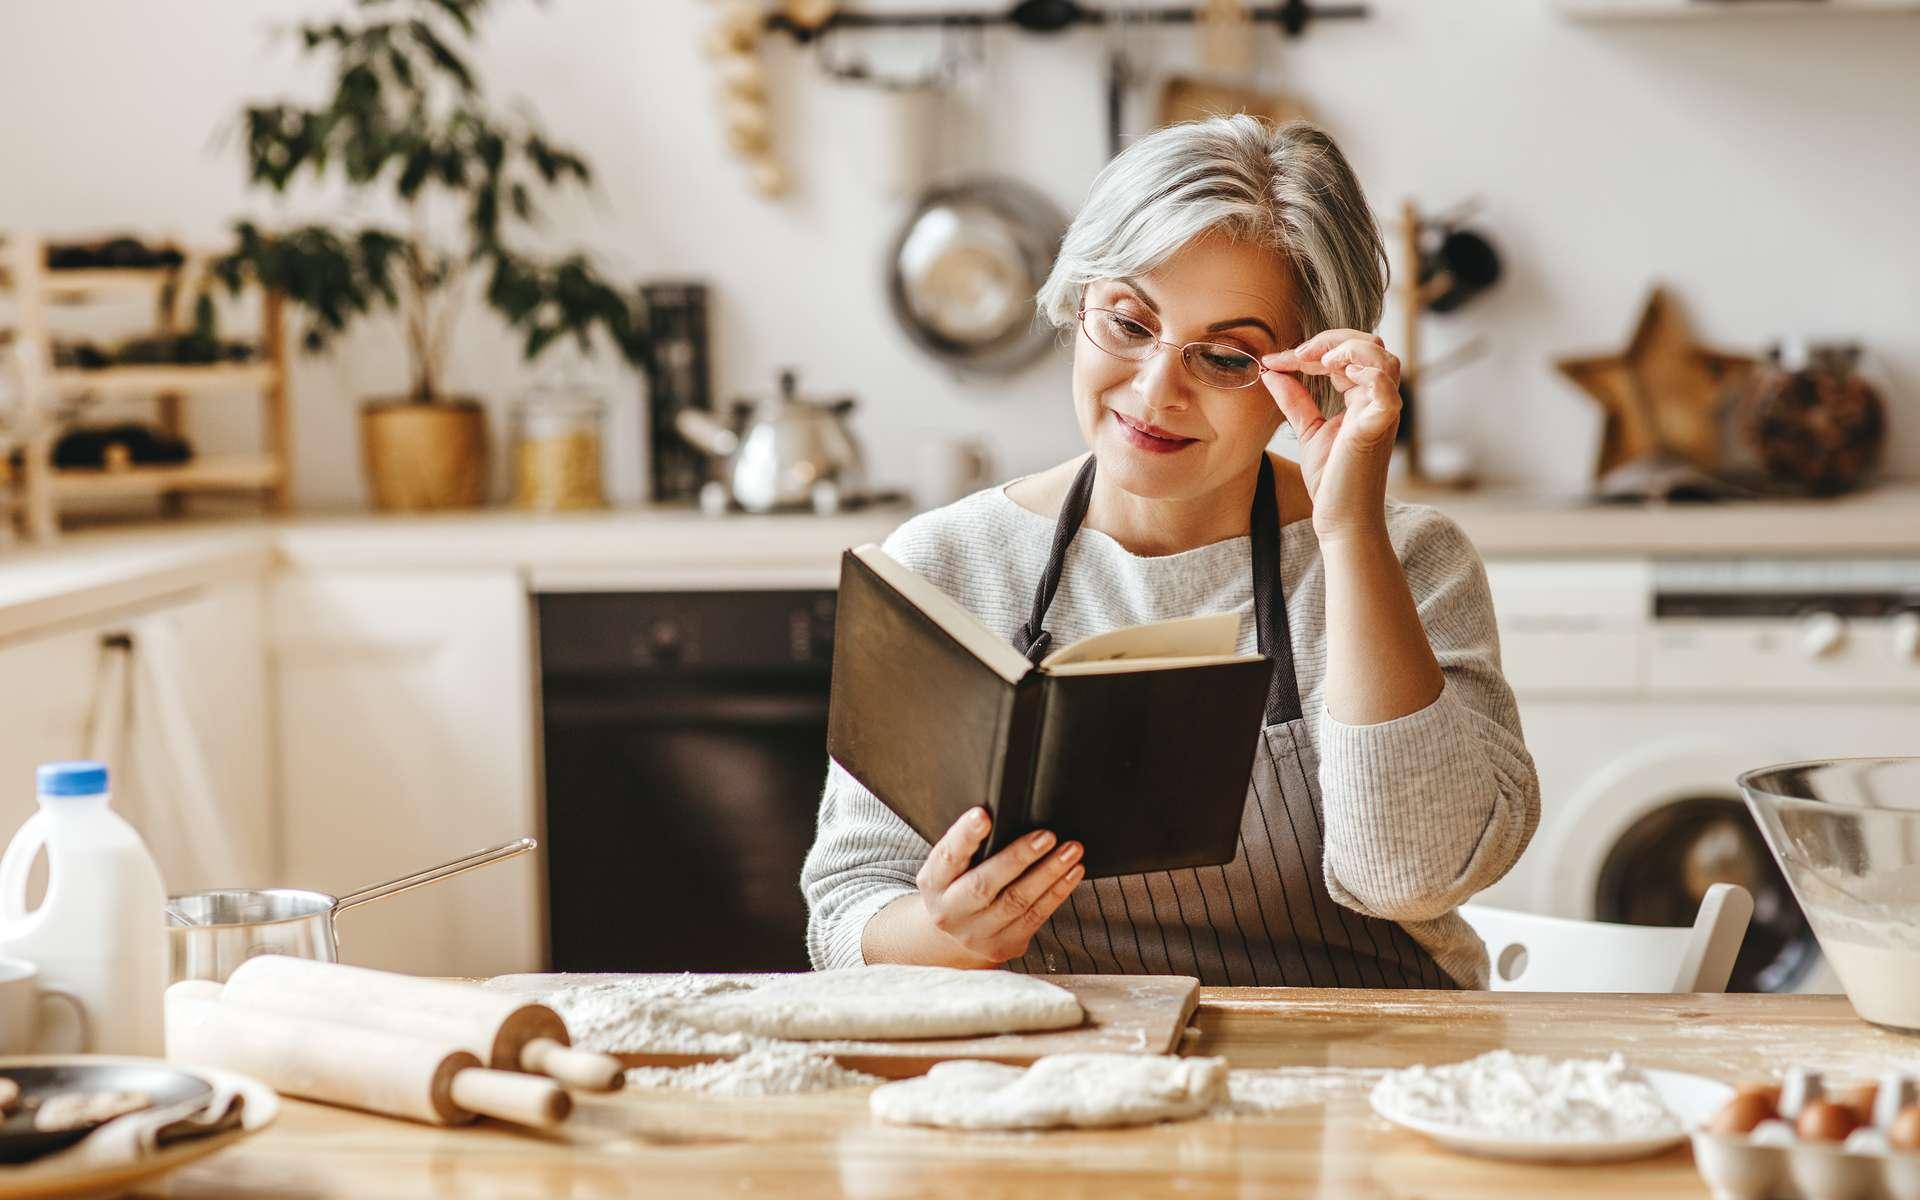 Selon Arnaud Cocaul, les recettes de grand-mère sont saines. © Jenko Ataman, Adobe Stock